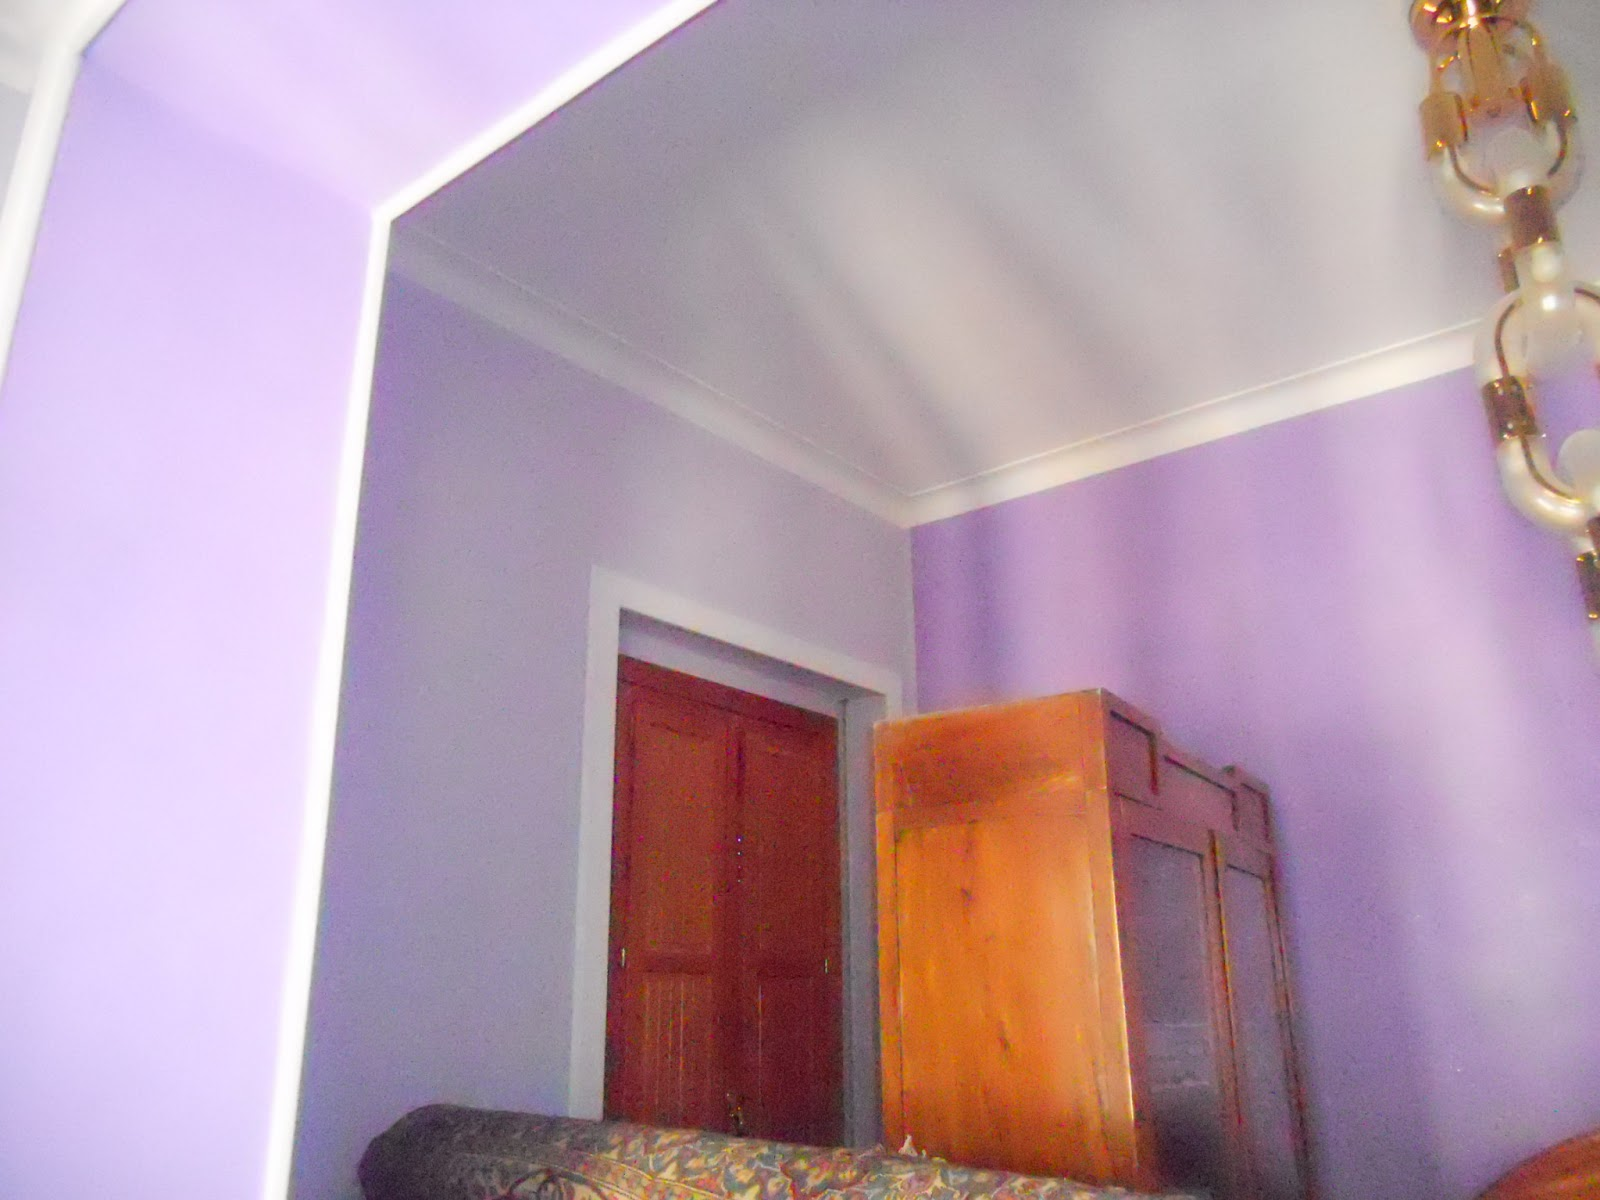 Pareti Glitterate Lilla : Pareti glitterate lilla: pareti con brillantini pittura grigio perla